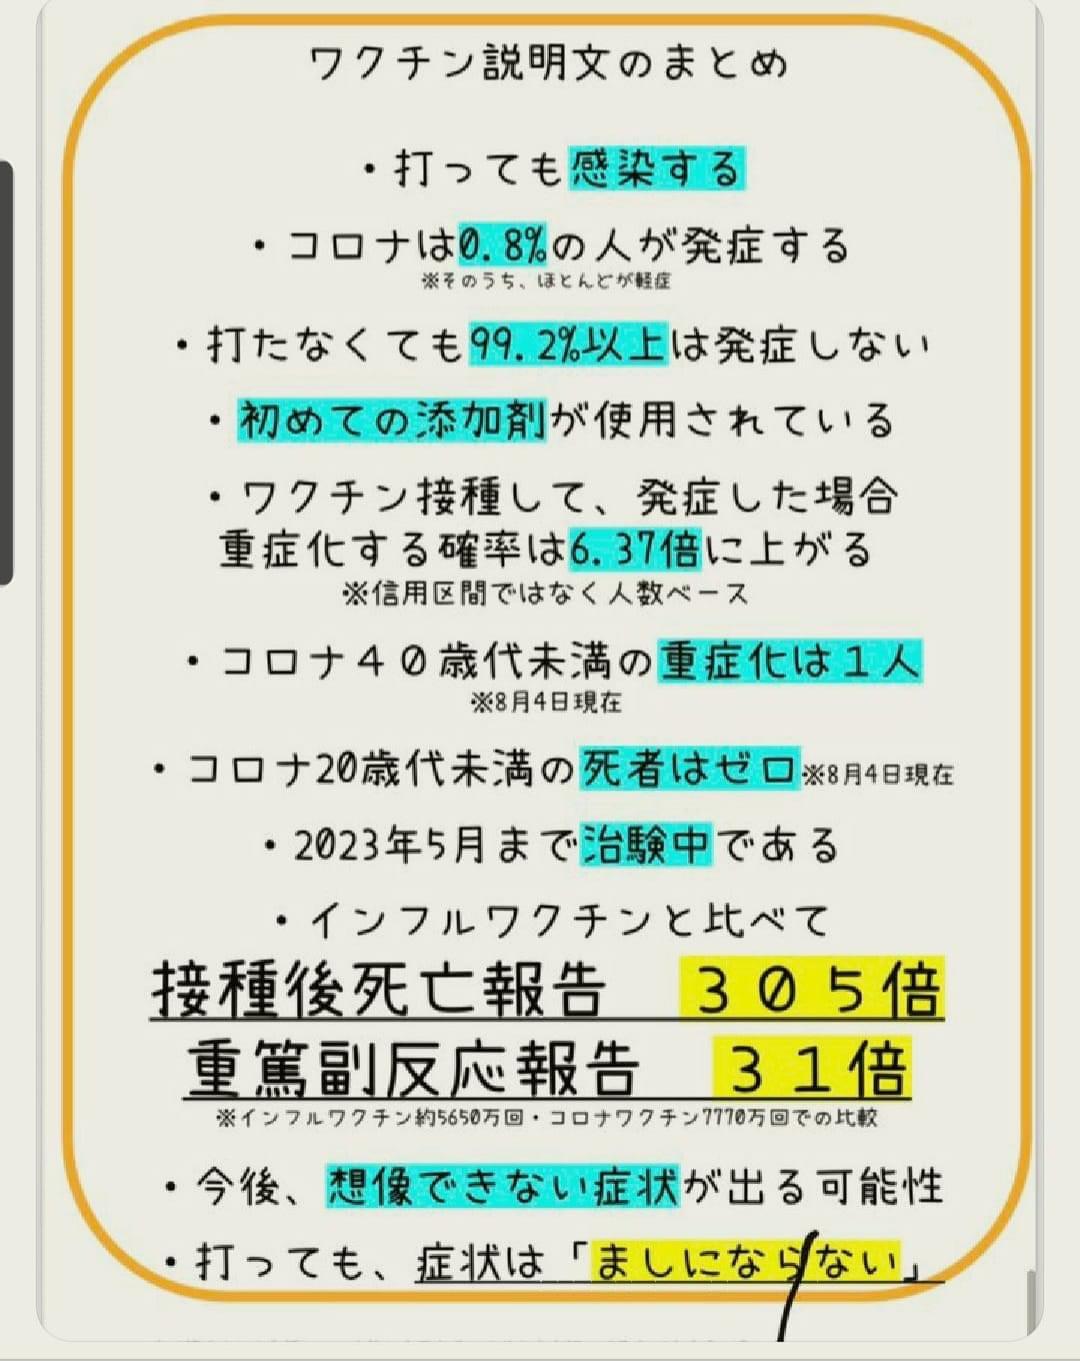 7D9DE254-AA36-4DD7-B7DC-8B7714C47388